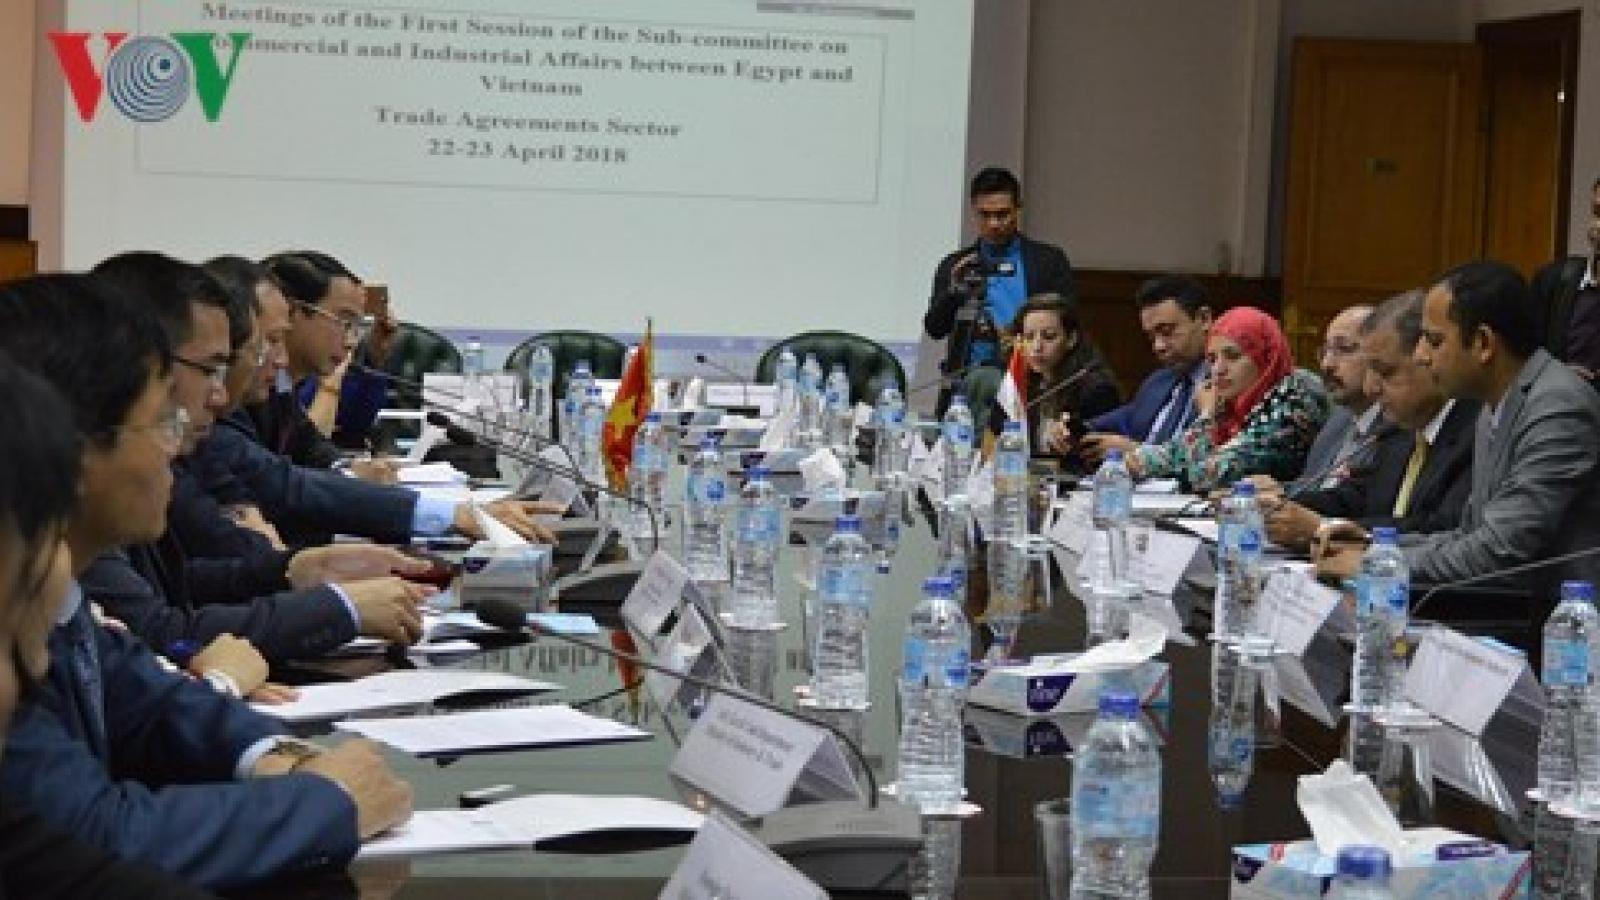 Vietnam, Egypt show determination to effectively realize trade deals